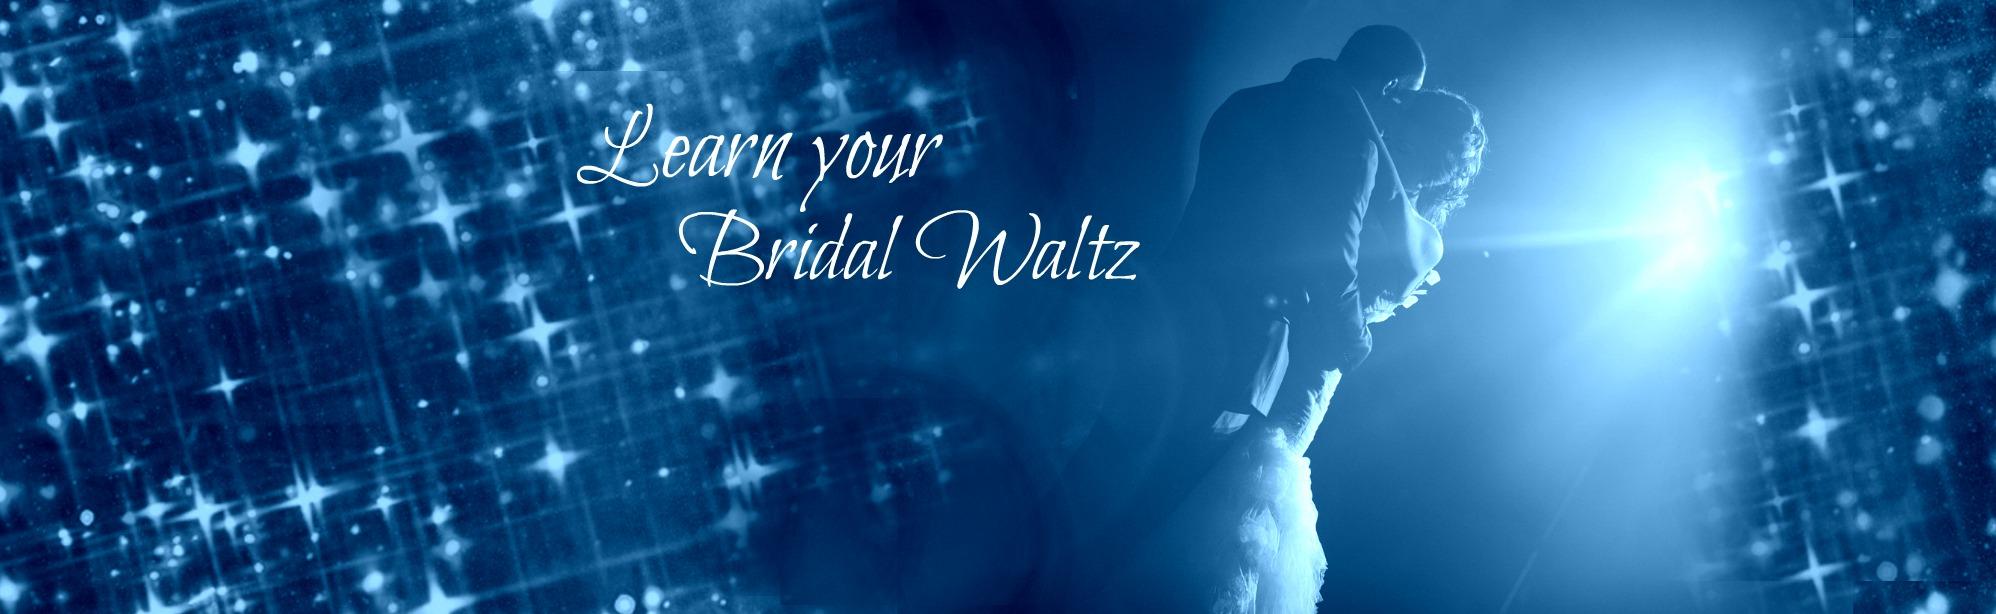 learn your bridal waltz at Peninsula Ballroom.jpg